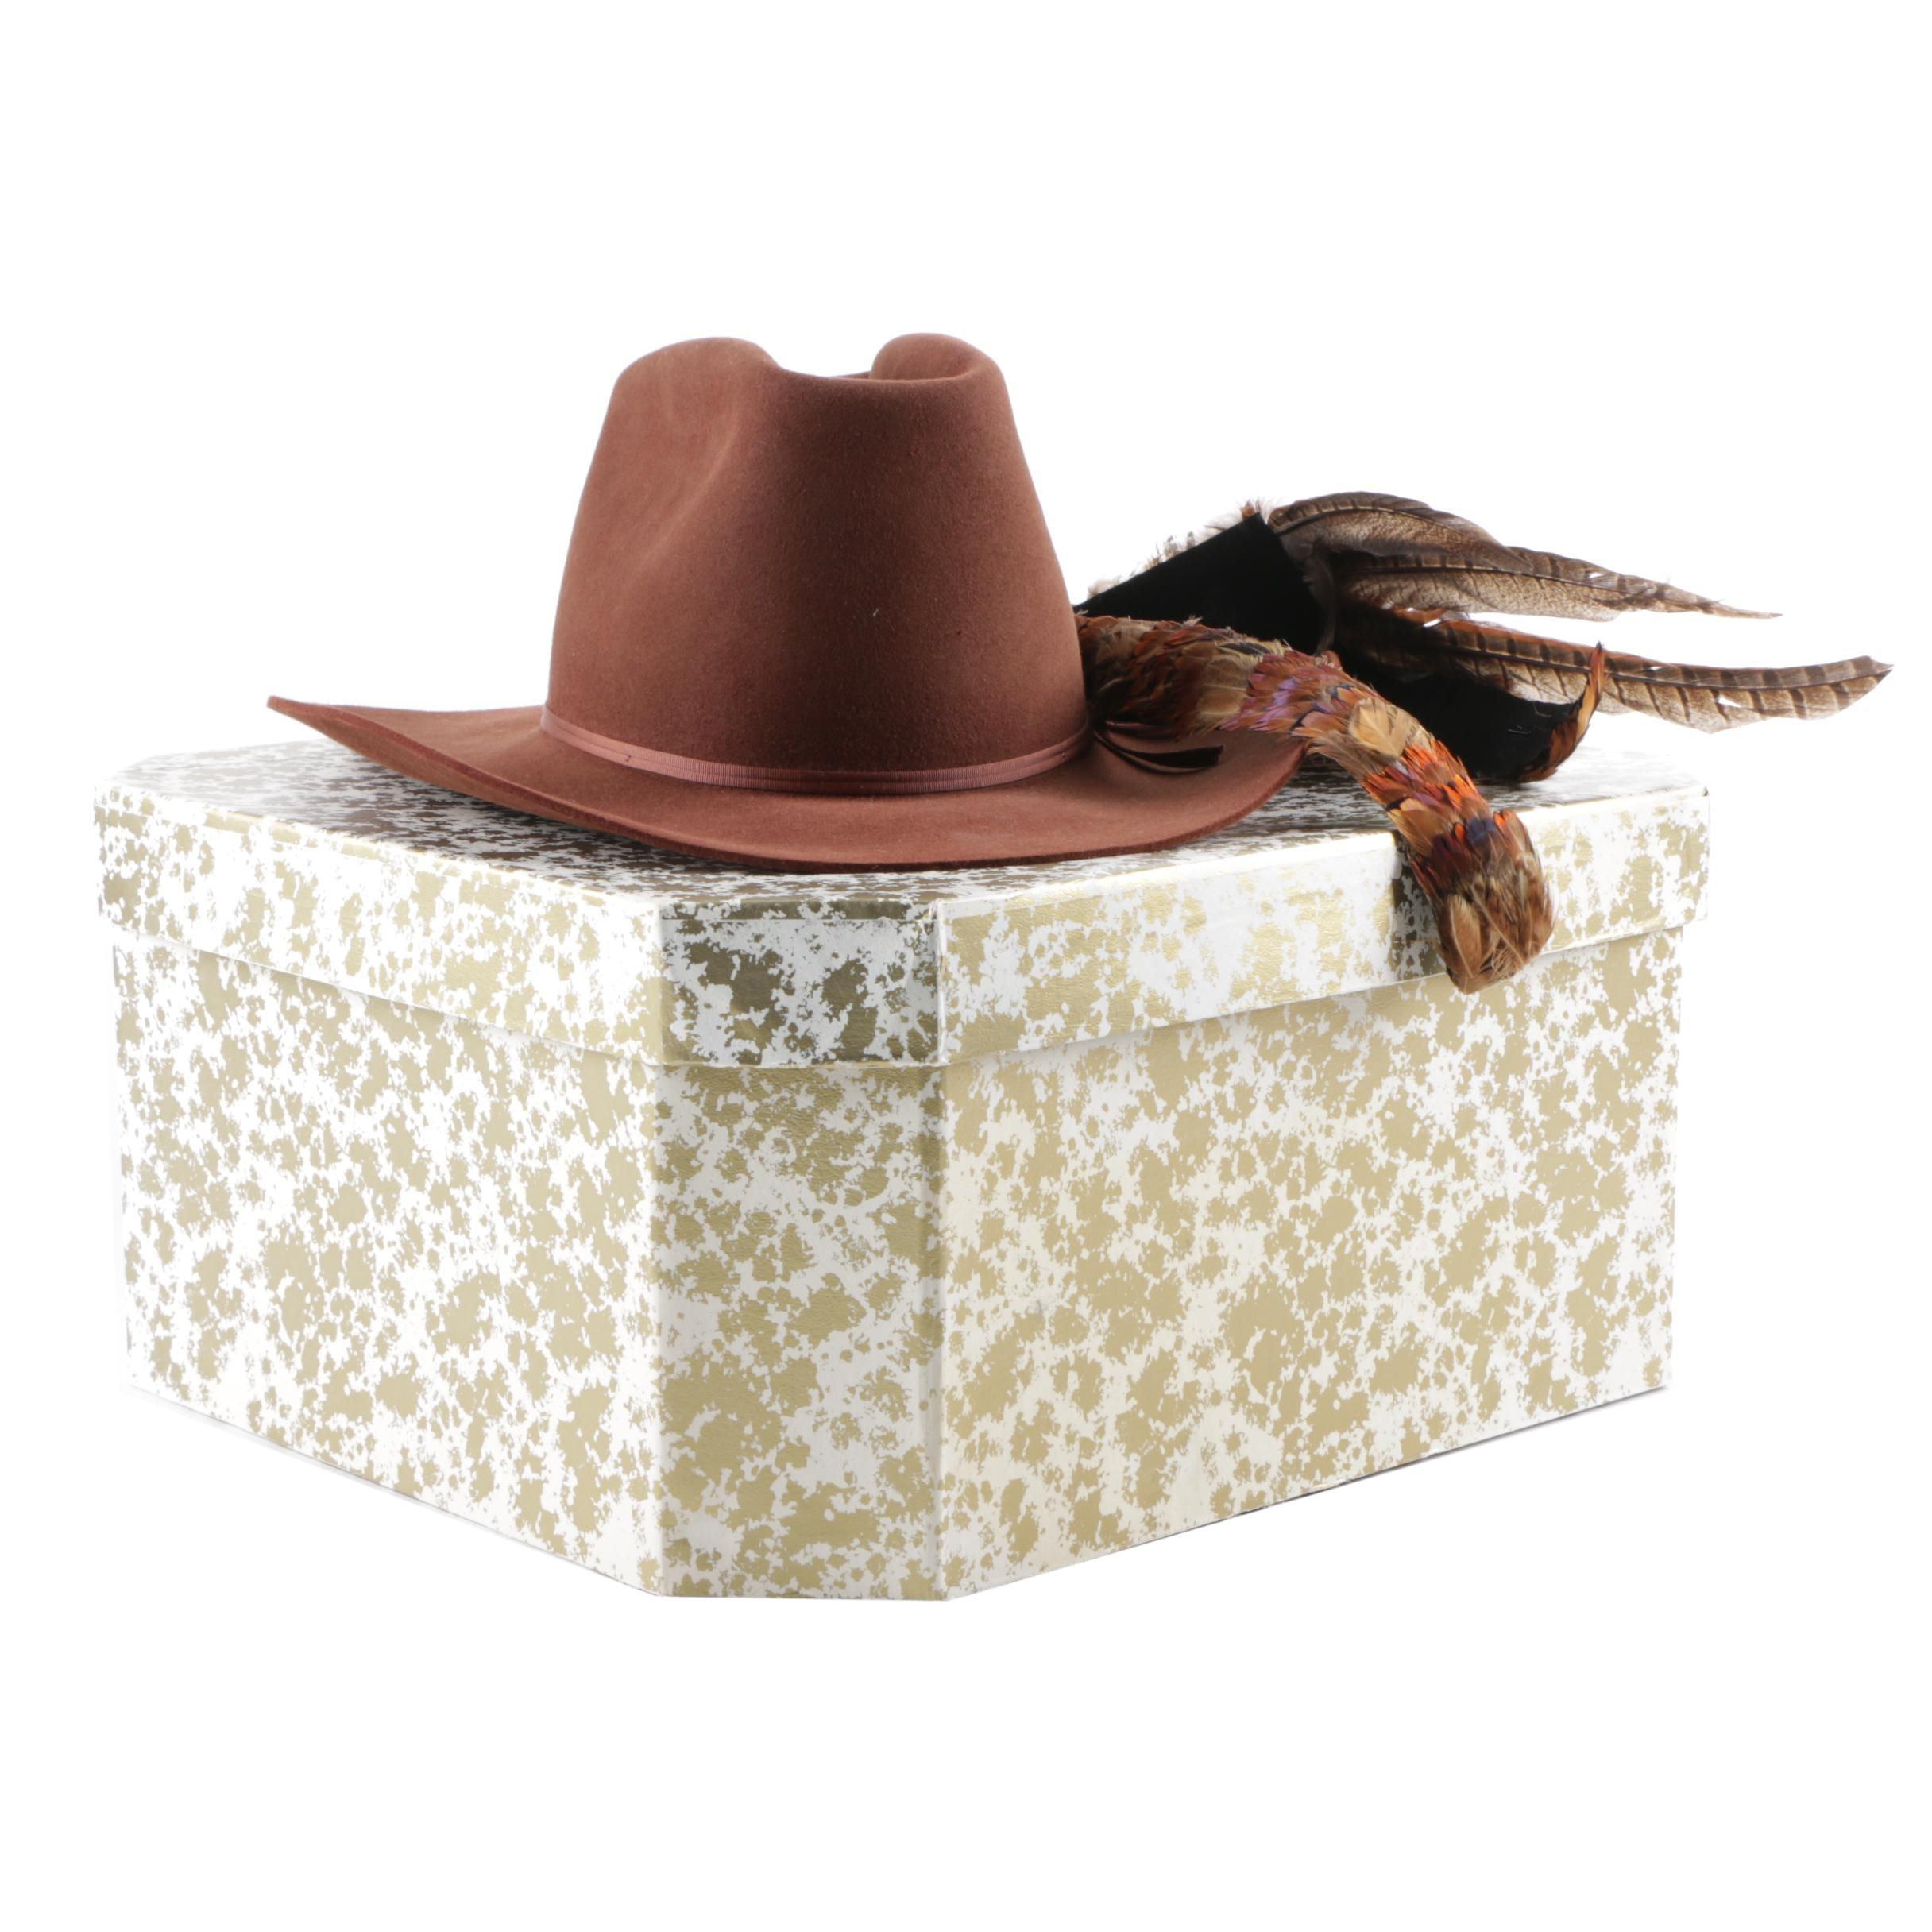 Men's Arizona Sun Bespoke Felted Western Hat with Pheasant Feather Hatband